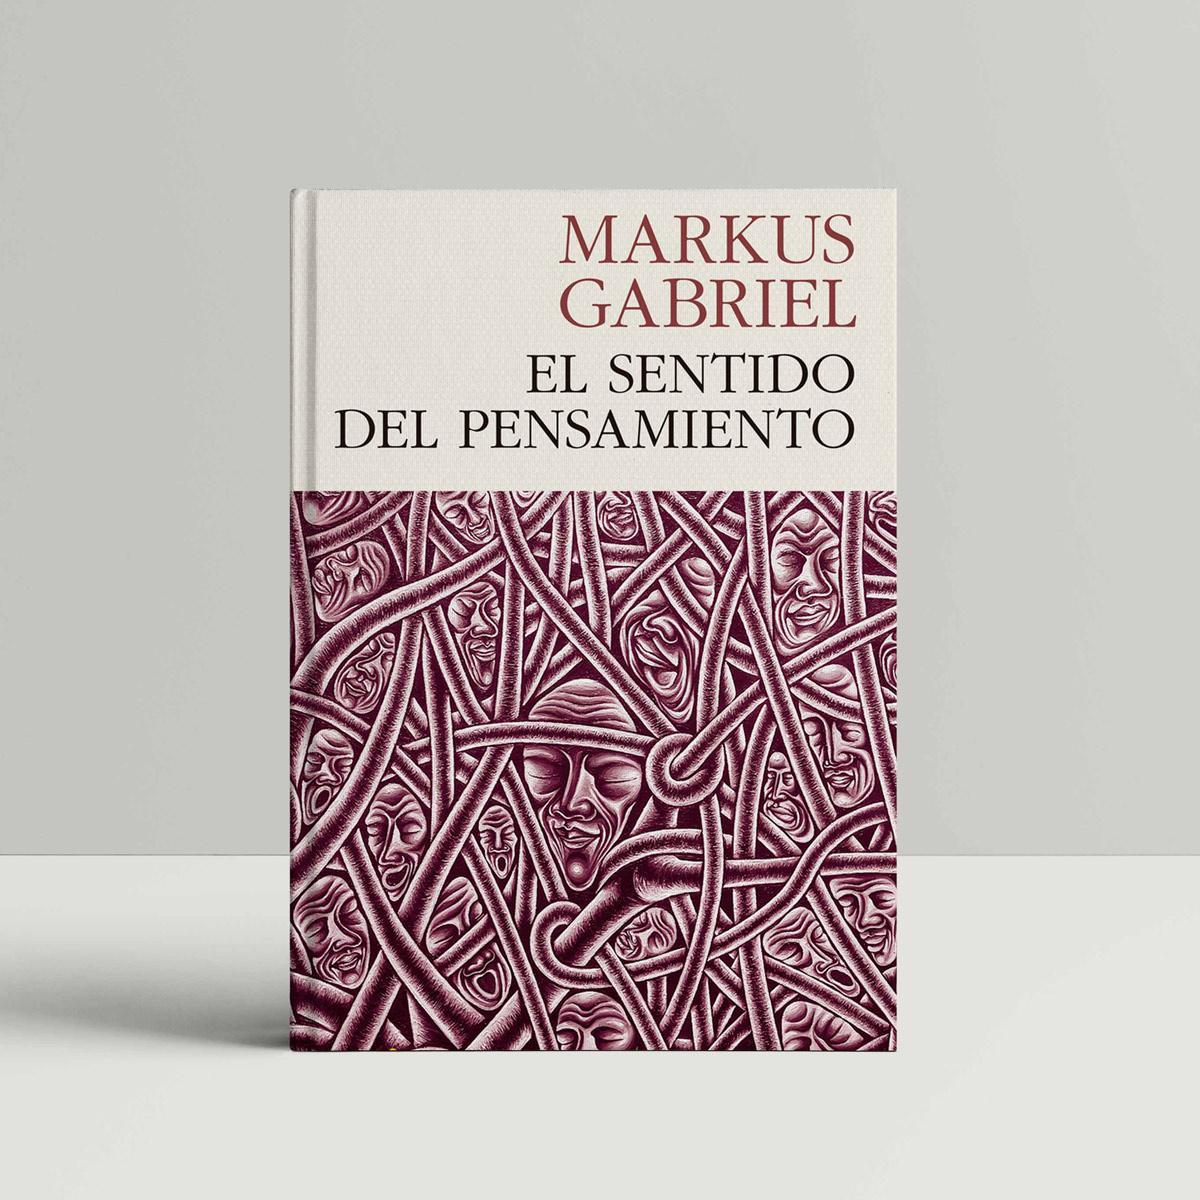 Markus-Gabriel_03